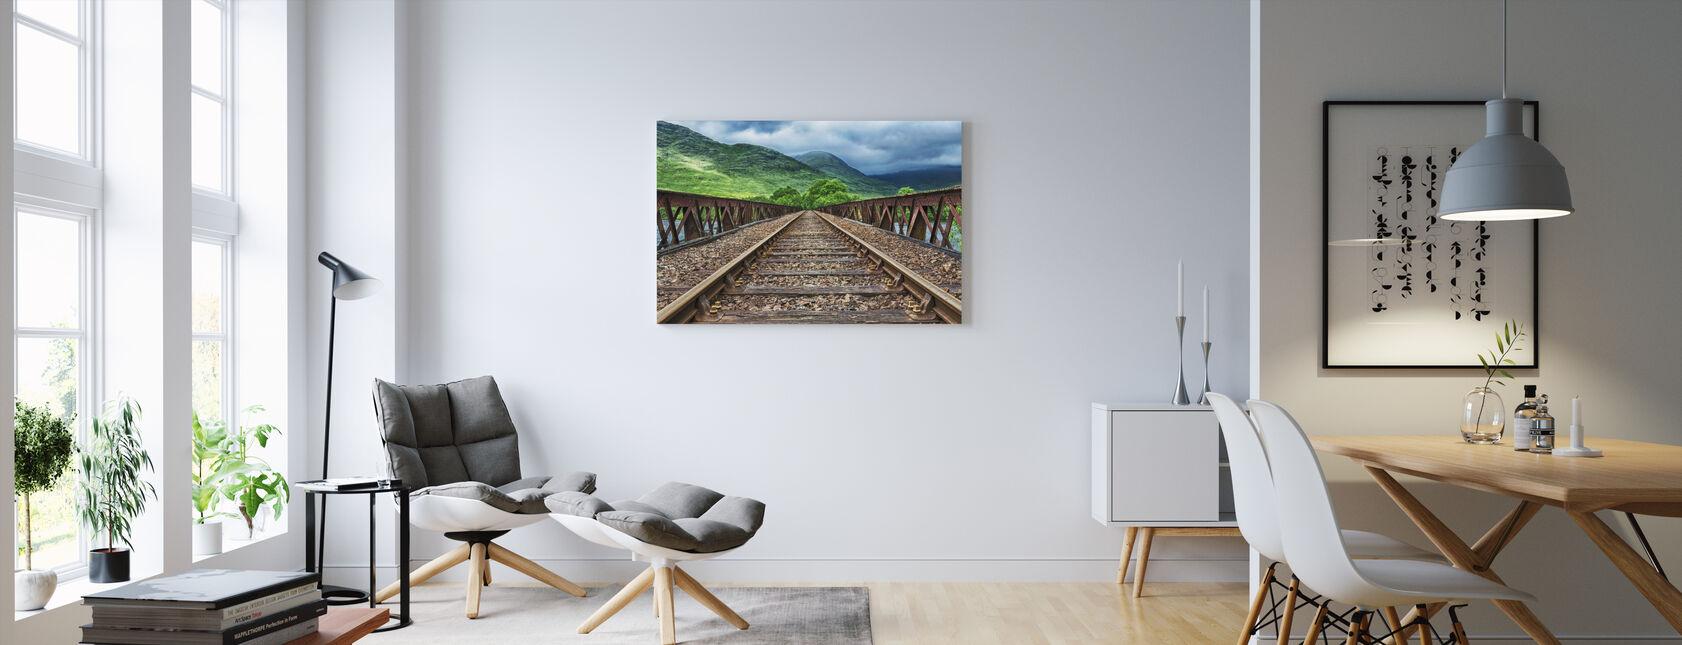 Railway Bridge Tracks - Canvas print - Living Room